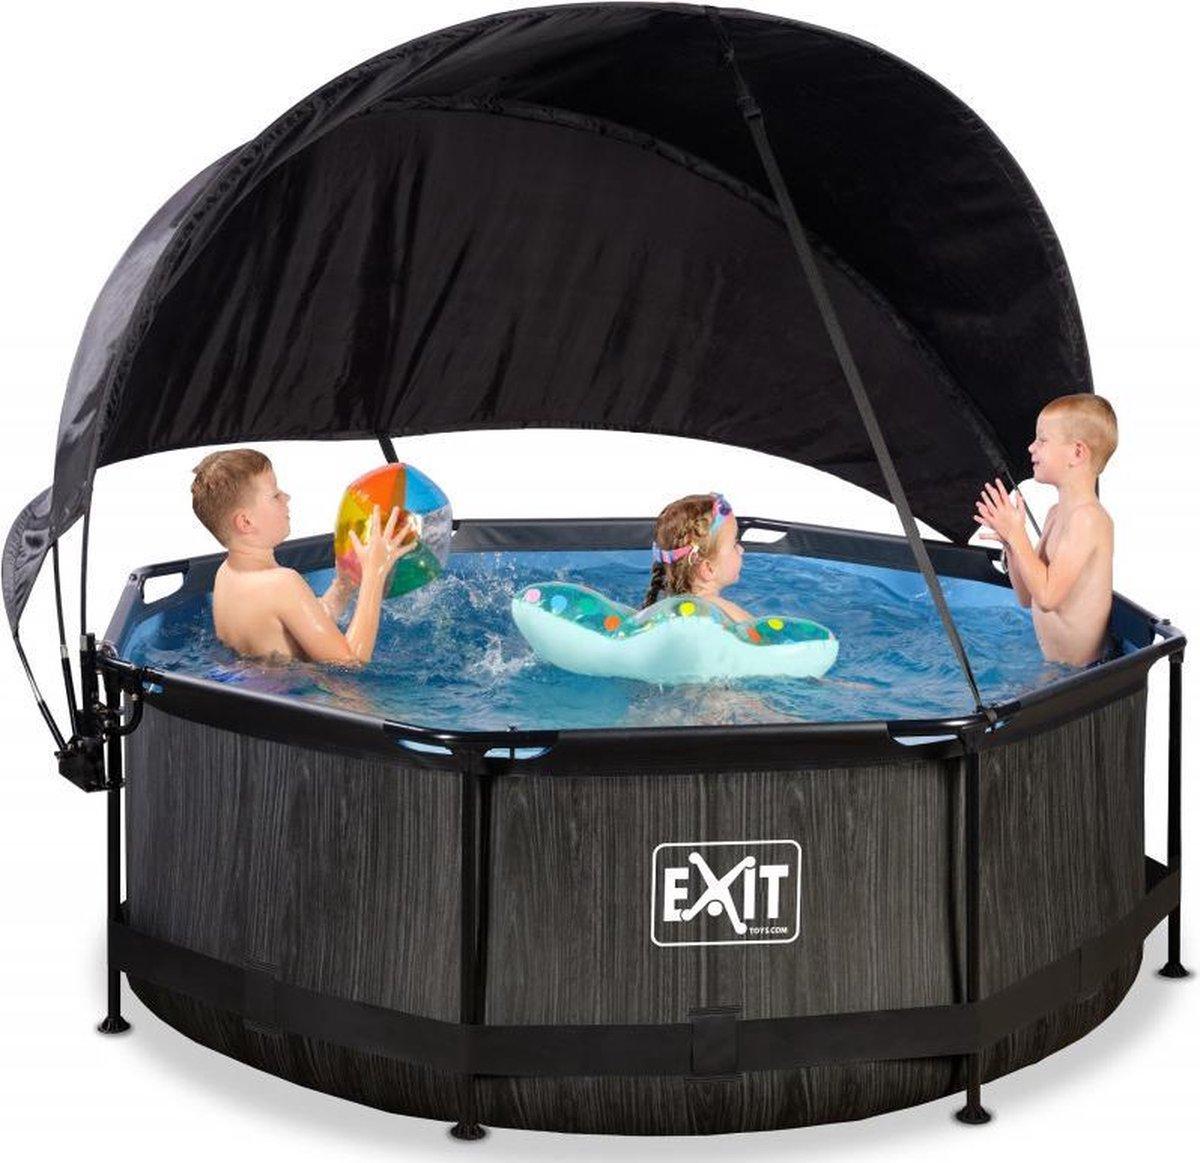 EXIT Zwembad Frame Pool Black Wood Limited Edition - 244 x 76 cm met Zonnedak en Cartridge Filterpomp